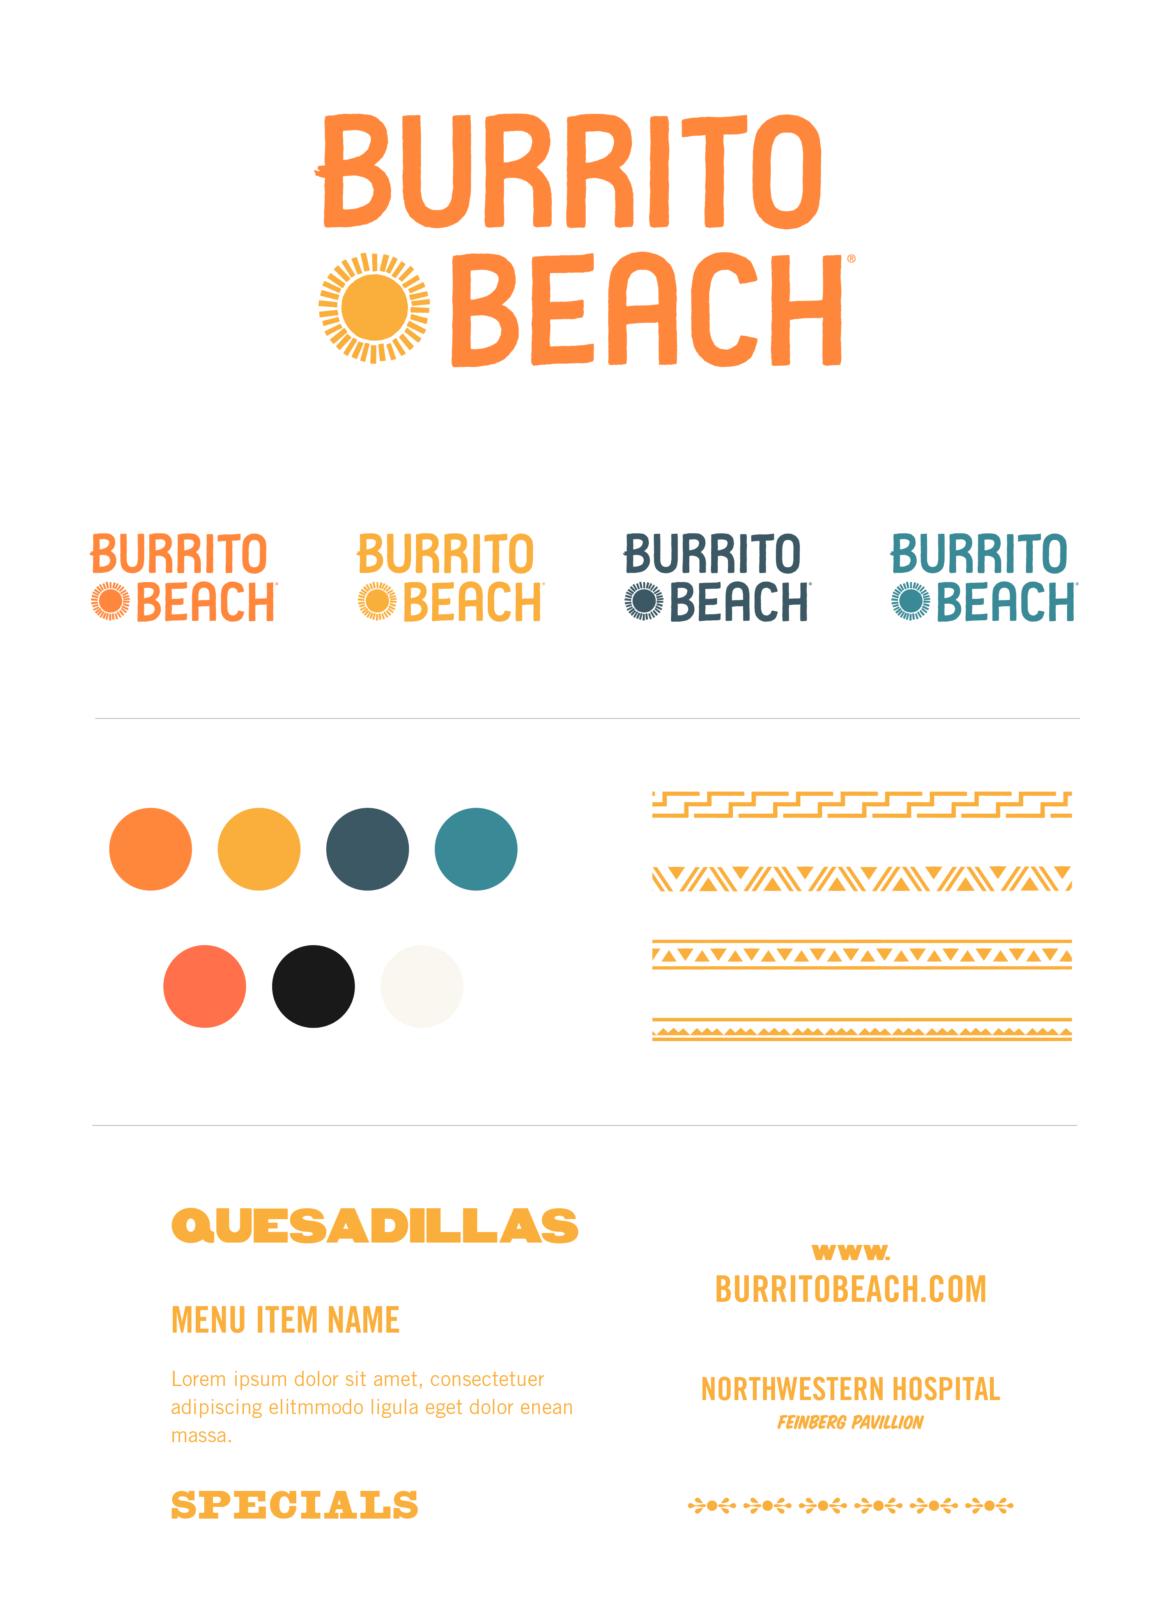 KarenMessing_BurritoBeach_Branding